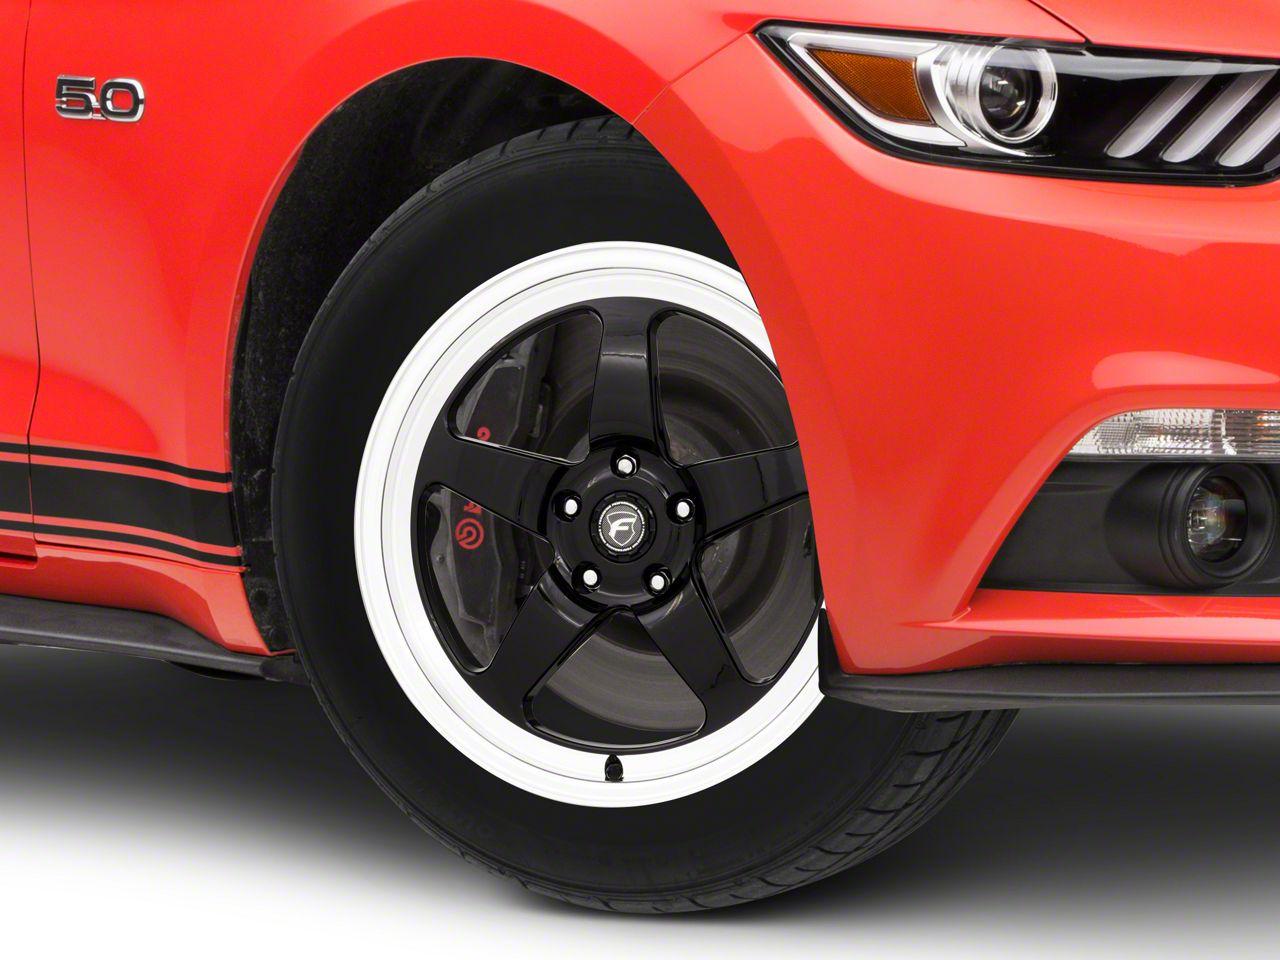 Forgestar D5 Drag Black Machined Wheel - 18x5 - Front Only (15-19 GT, EcoBoost, V6)